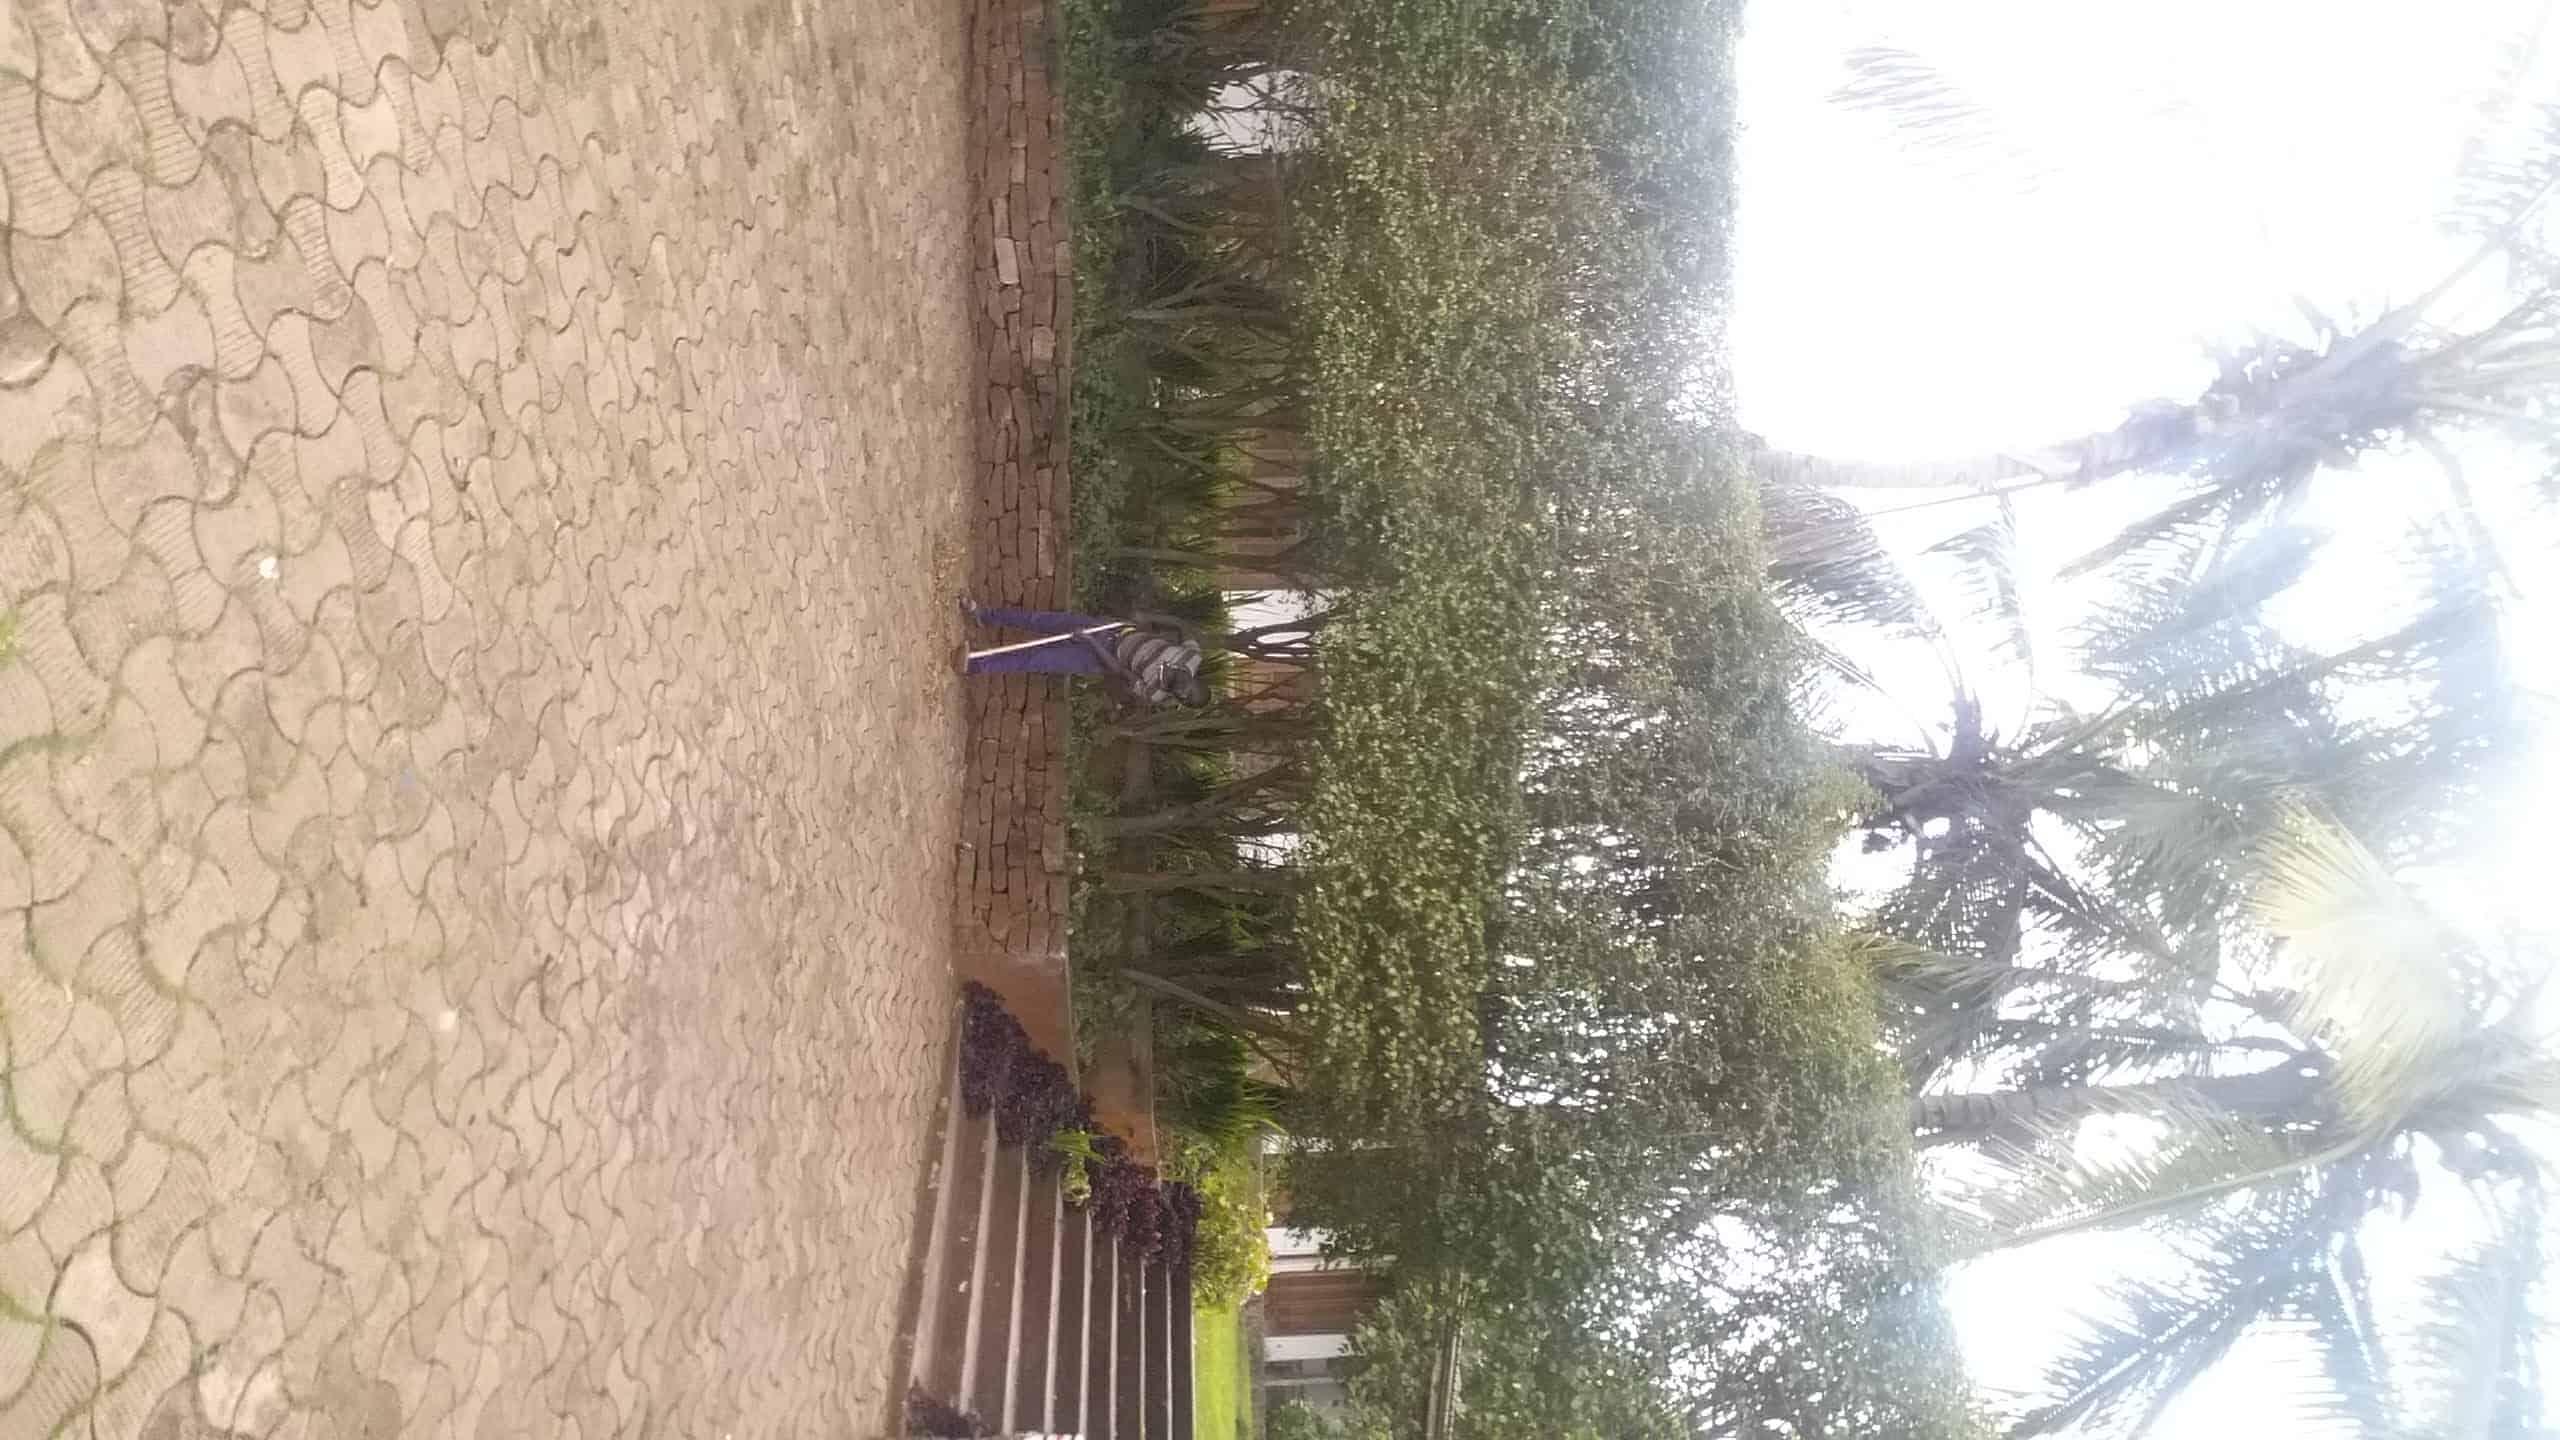 House (Villa) to rent - Yaoundé, Bastos, Bastos onusida - 2 living room(s), 4 bedroom(s), 4 bathroom(s) - 1 800 000 FCFA / month